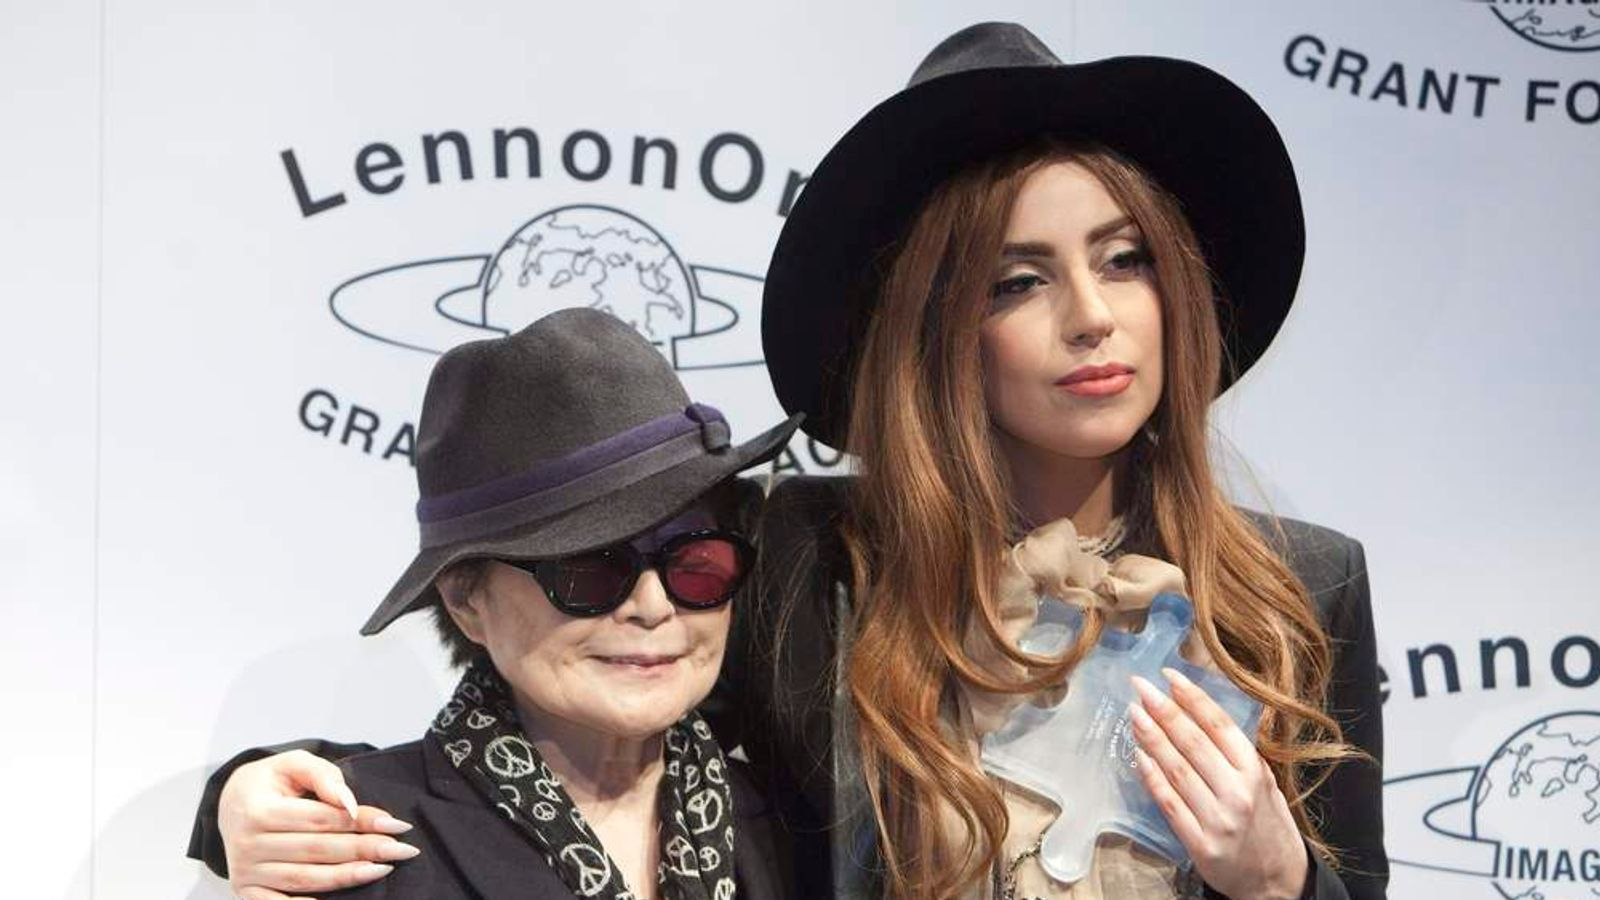 Yoko Ono and Lady Gaga